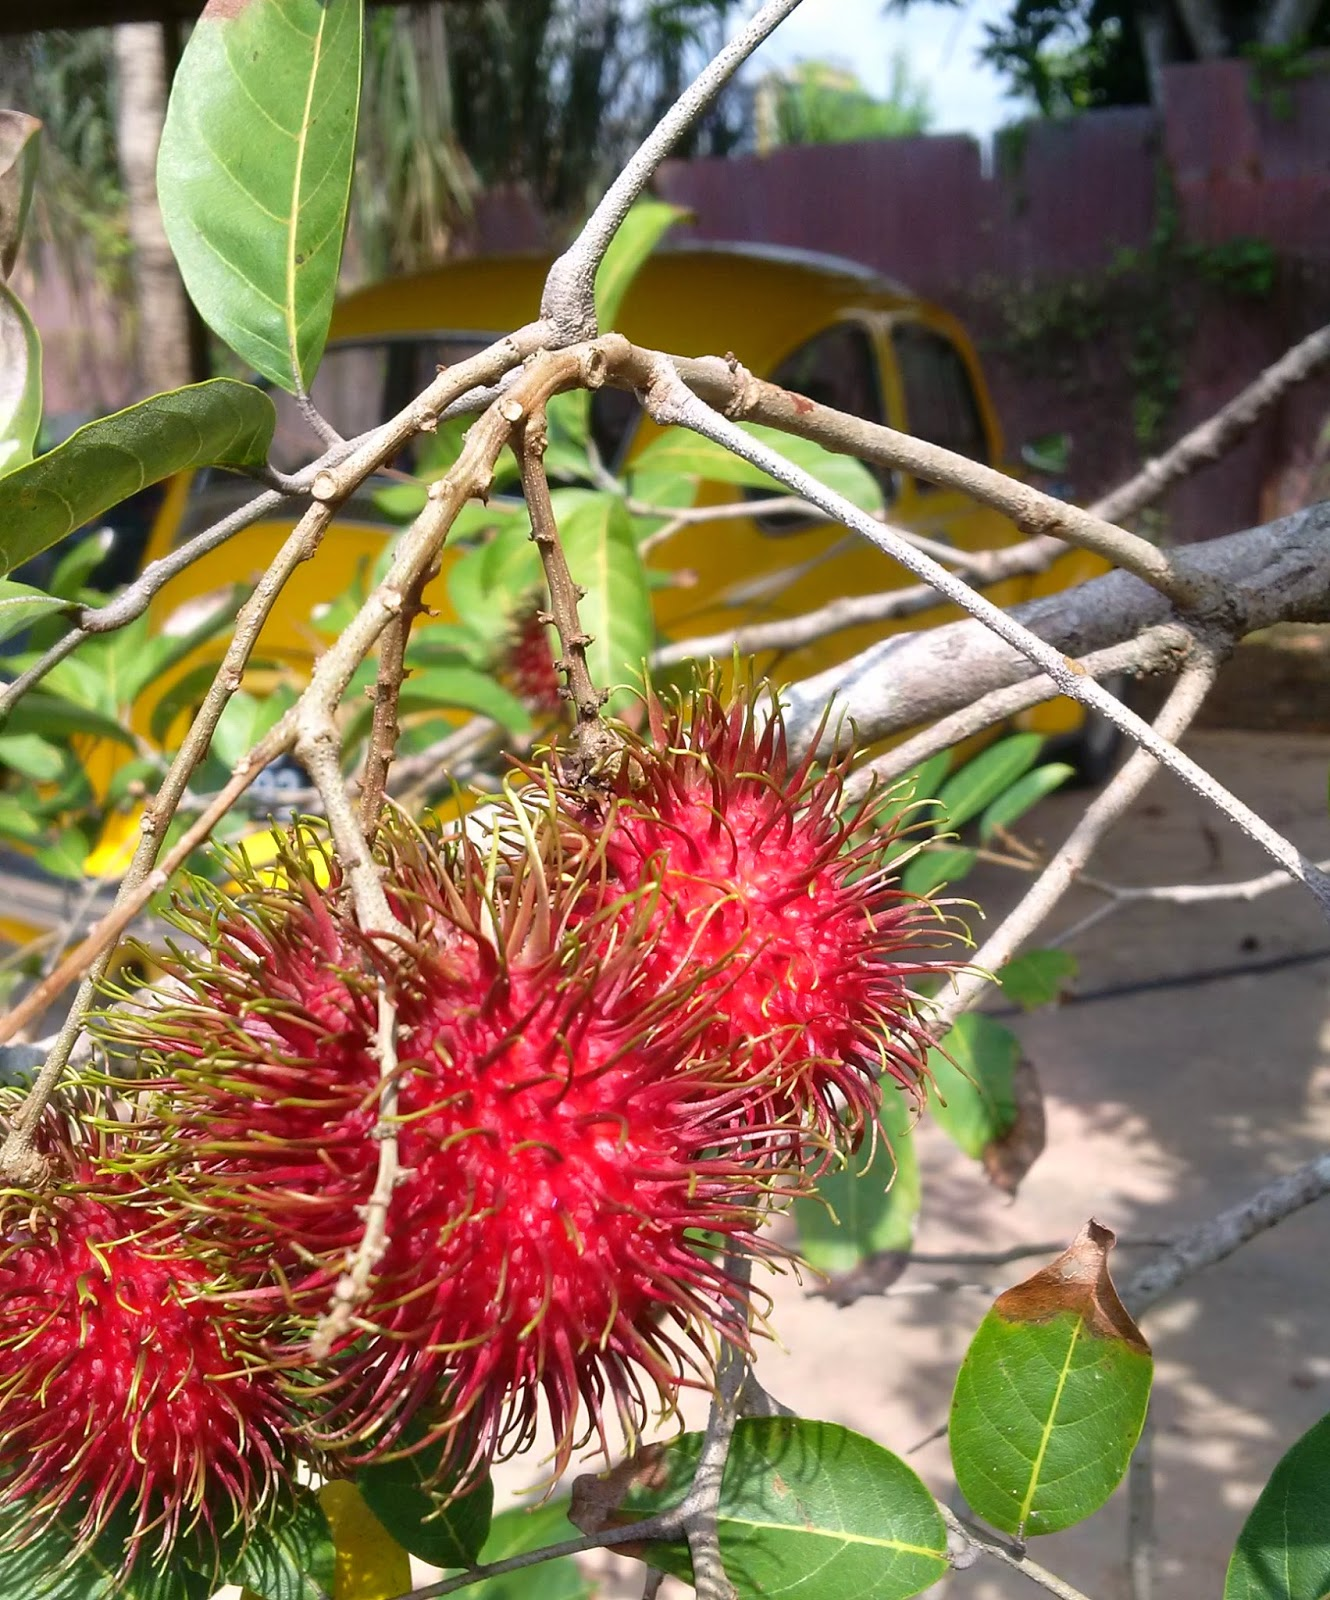 rambutan fruit, hairy fruit, rambutan malaysia, rambutan taste, rambutan benefits, rambutan recipes, gardening, food,